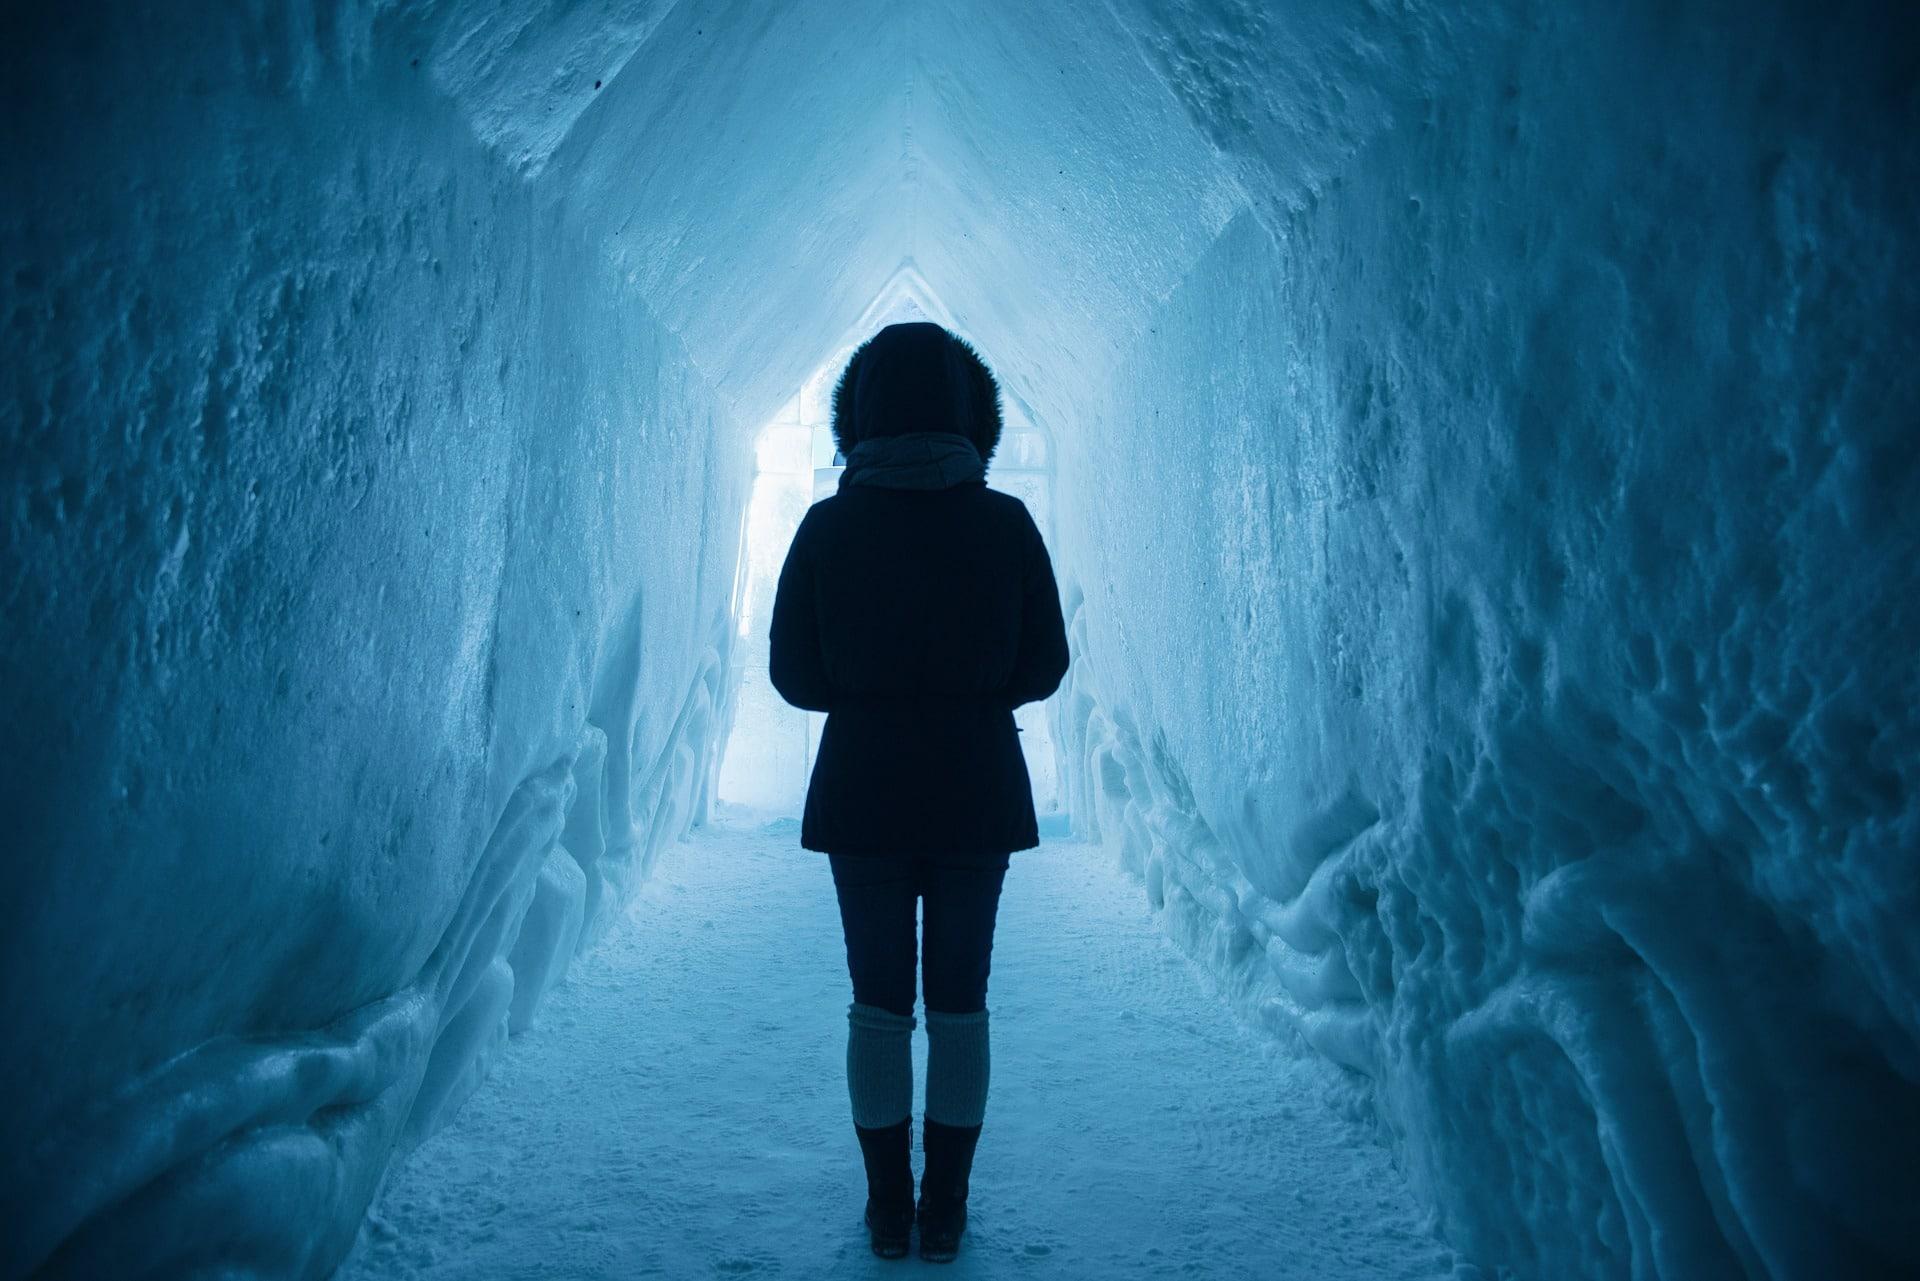 Criogenesi: l'ibernazione umana è realmente possibile?